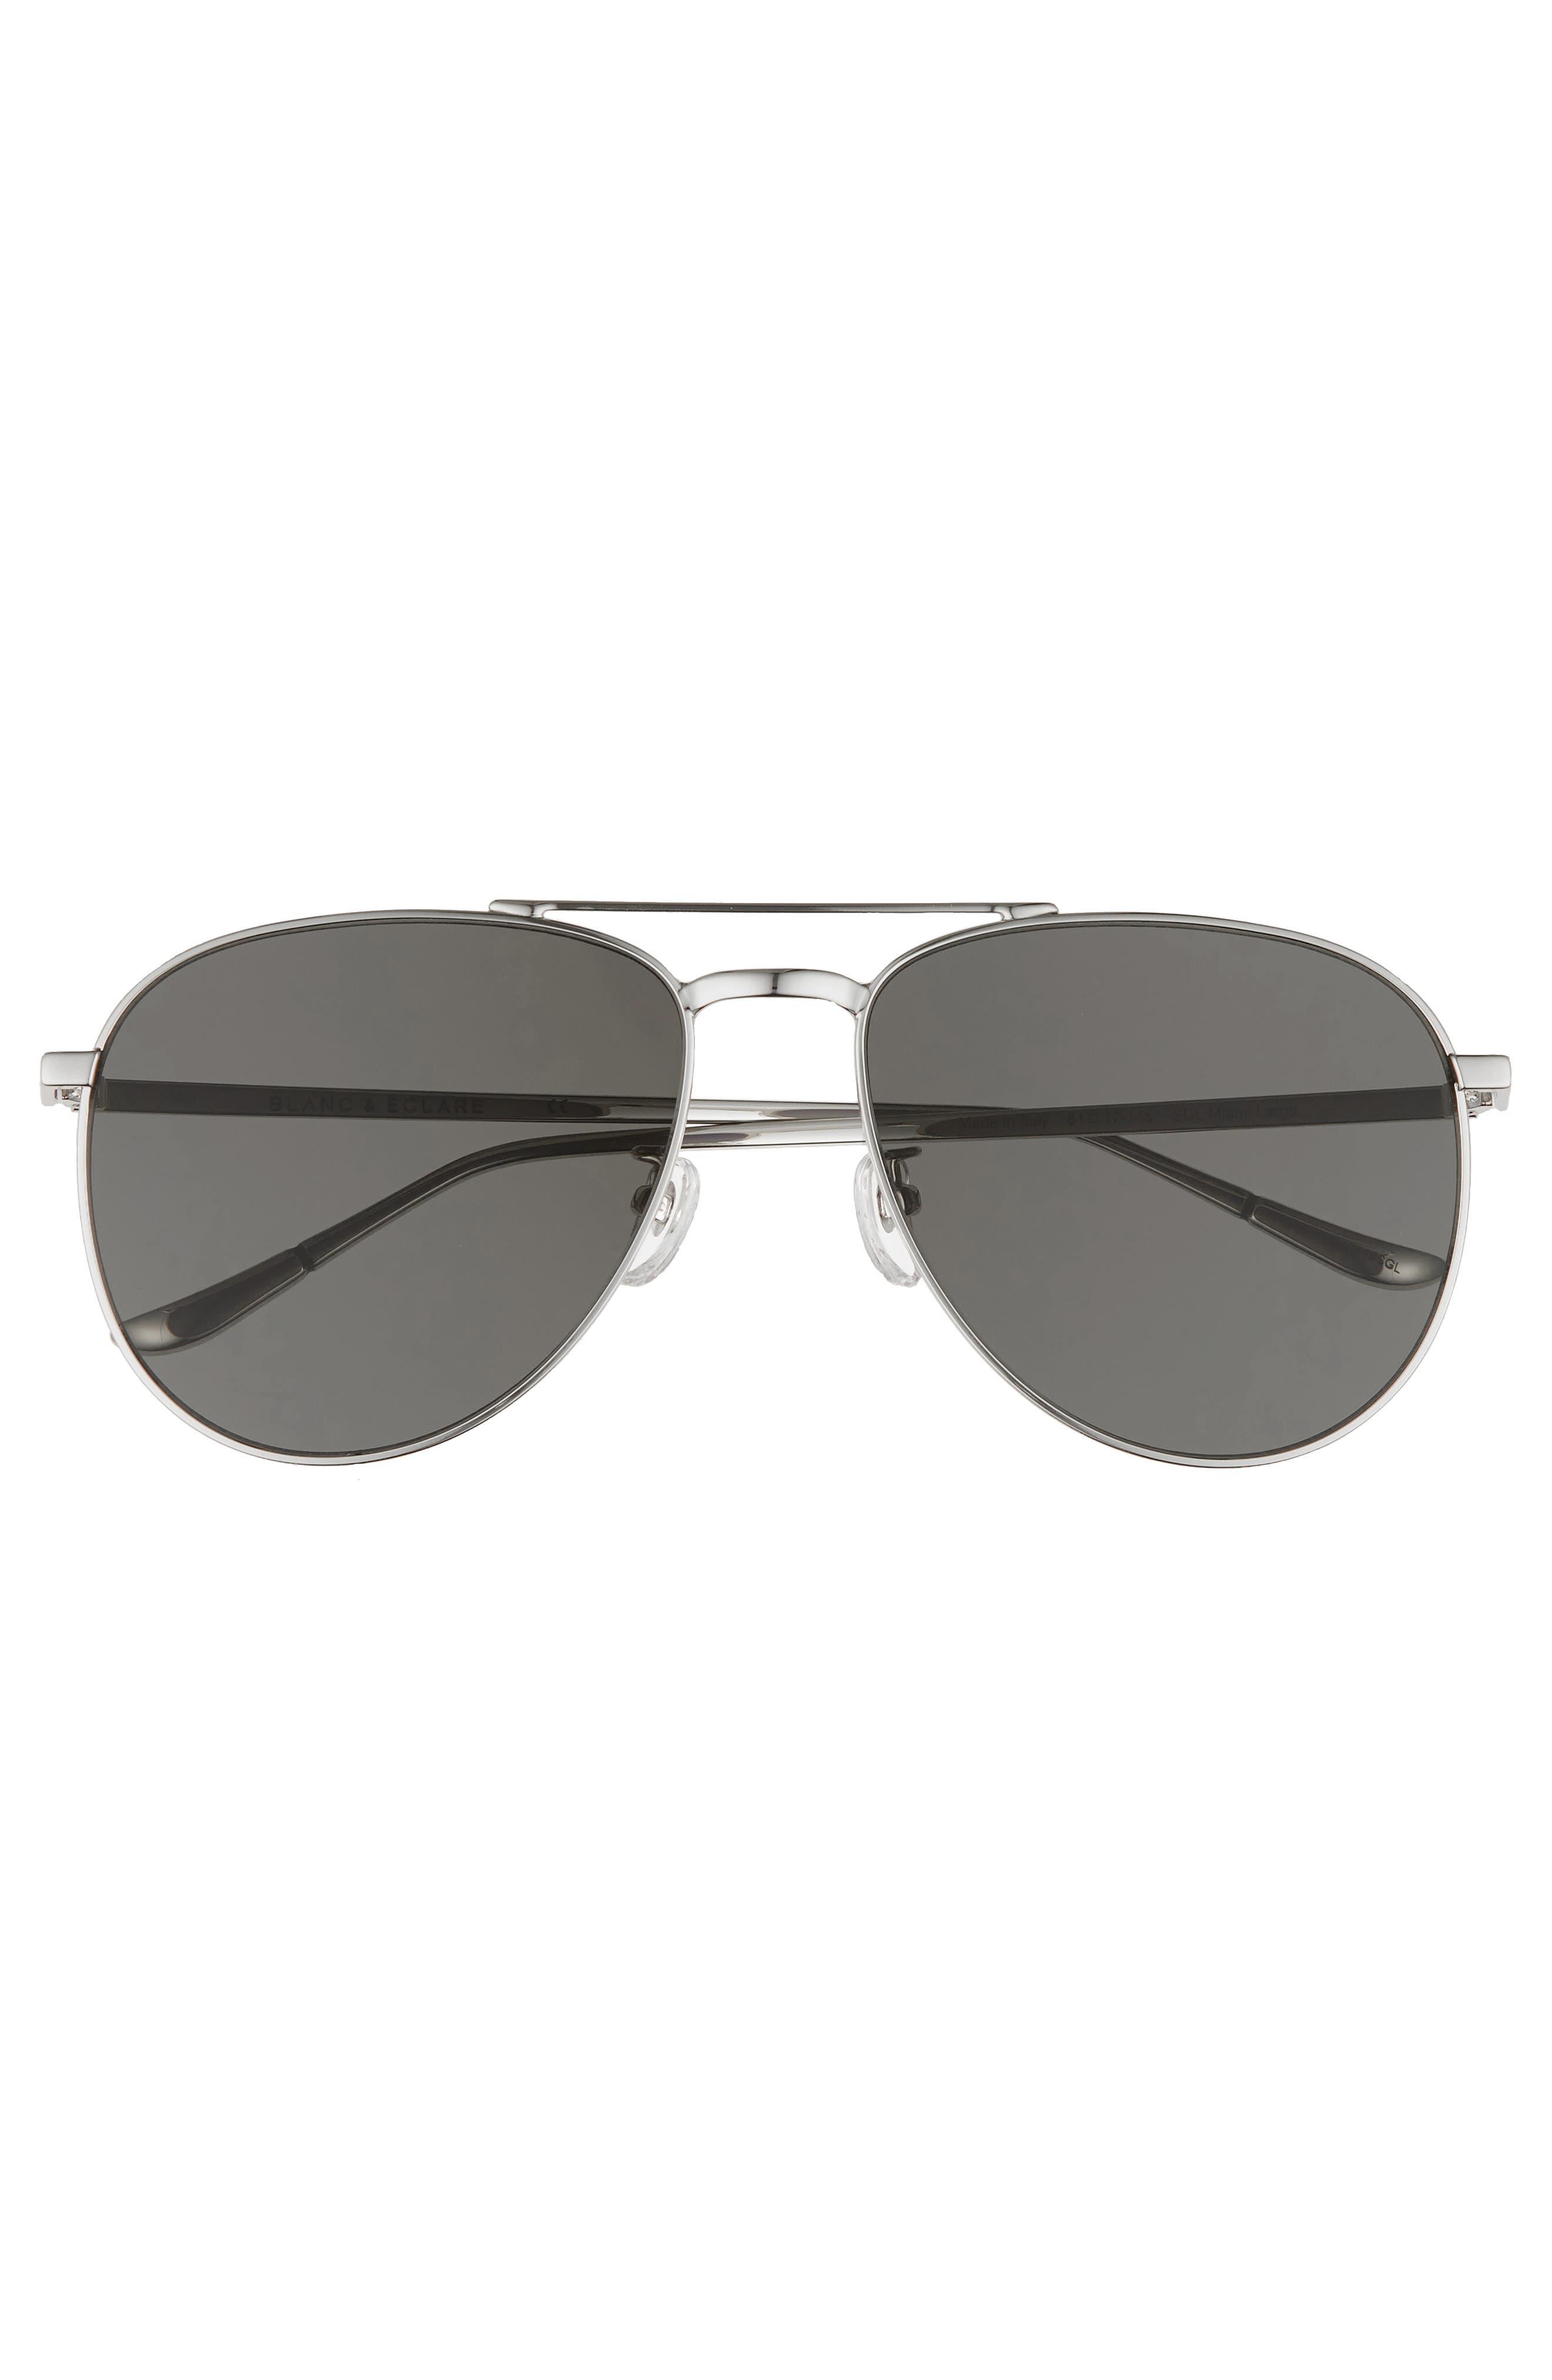 BLANC & ECLARE Miami 61mm Large Polarized Aviator Sunglasses,                             Alternate thumbnail 2, color,                             Silver/ Grey